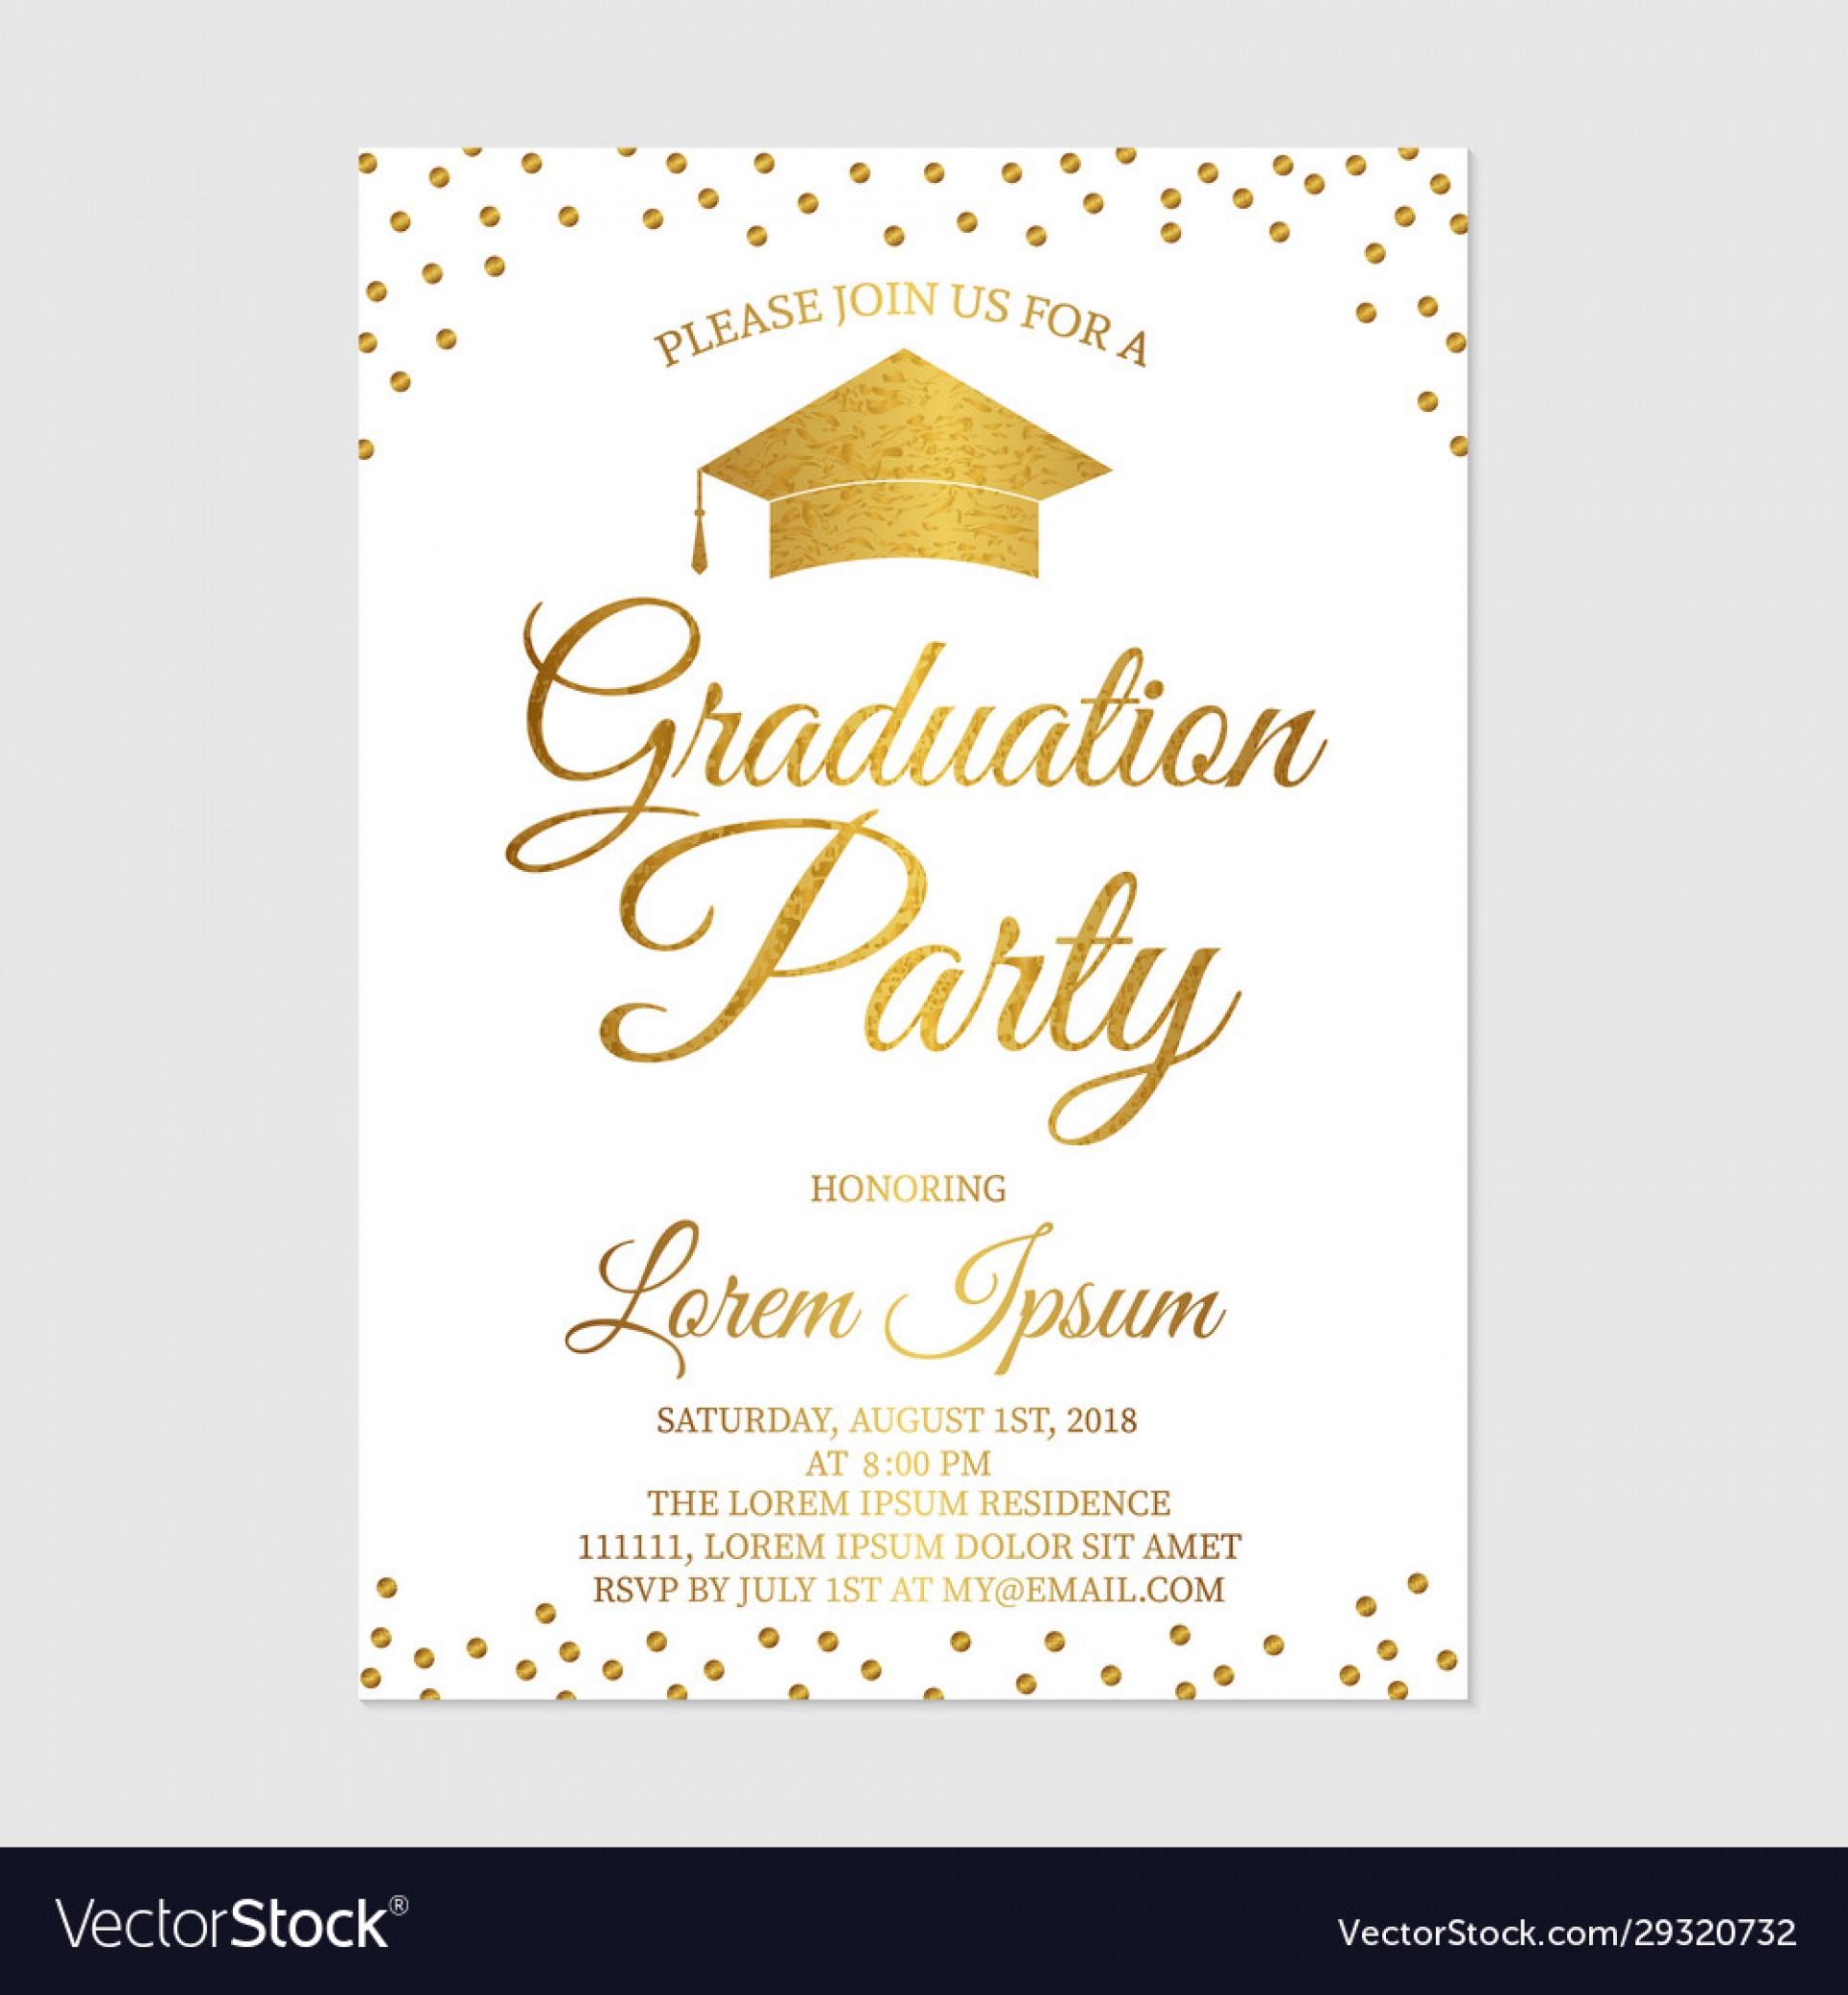 008 Beautiful Graduation Party Invitation Template Image  Microsoft Word 4 Per Page1920